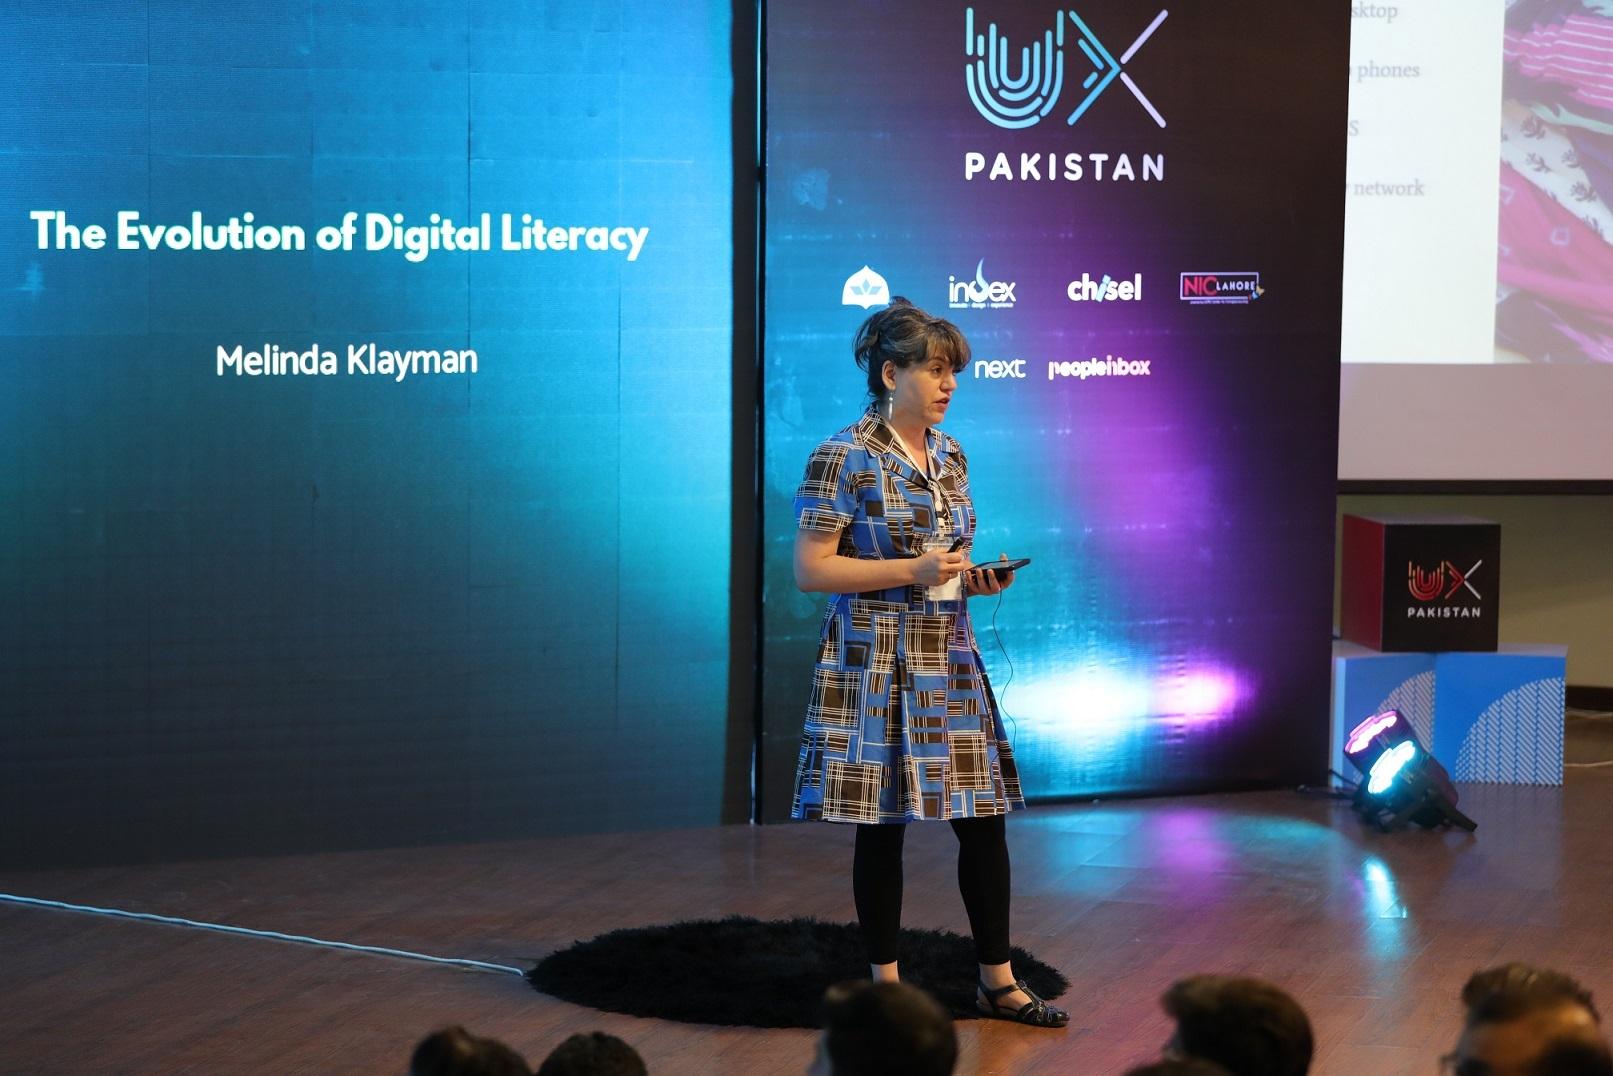 Melinda Klayman on Evolution of digital literacy at UX Pakistan